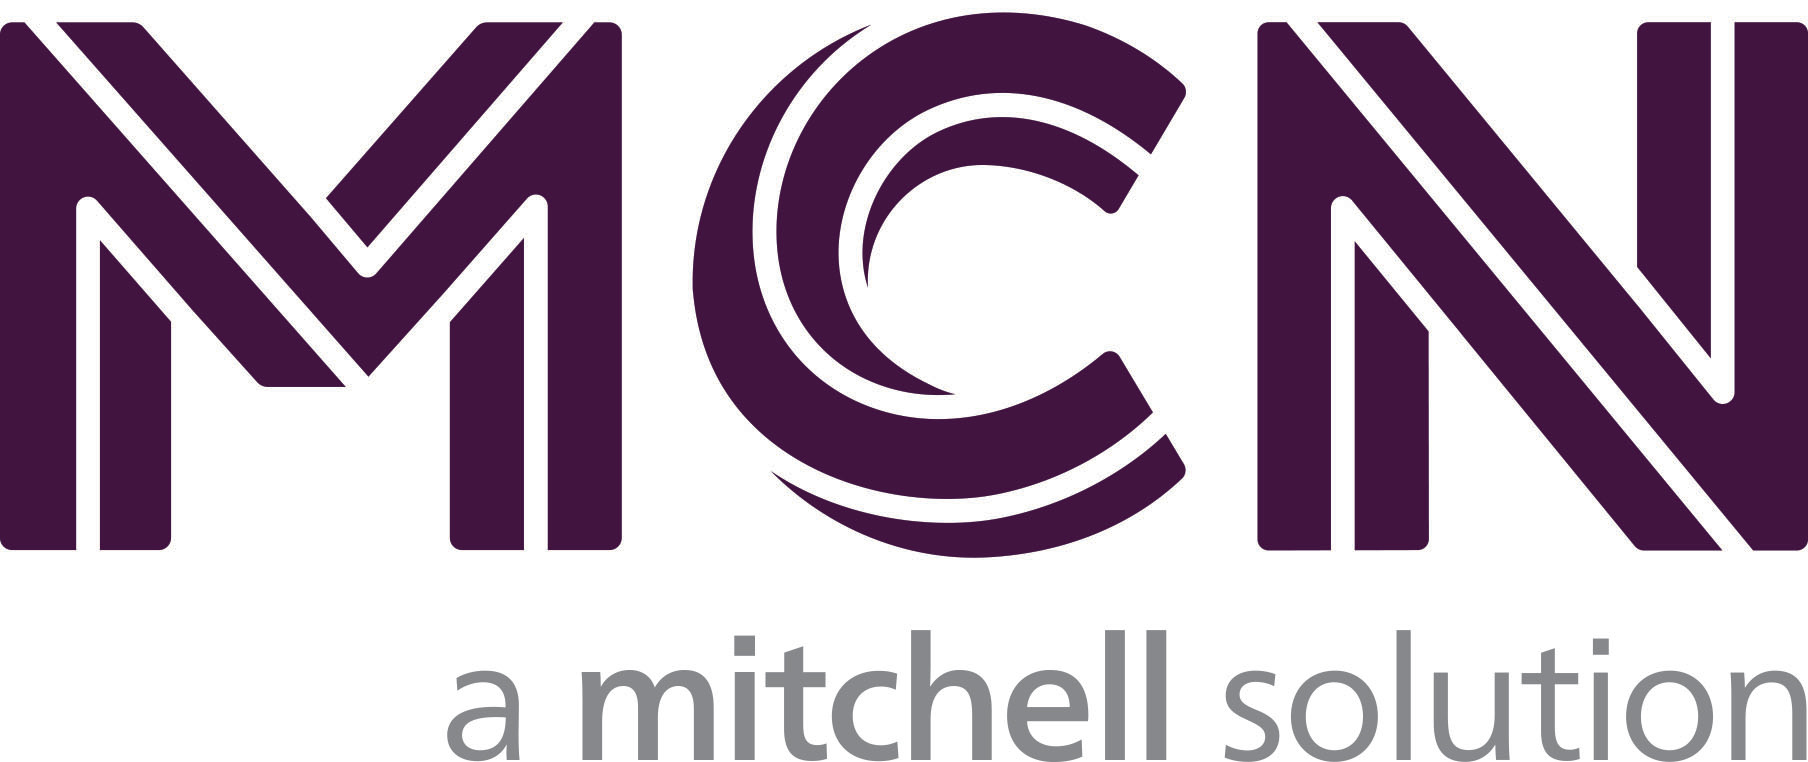 MCN_Logomark_4cp_mitchell